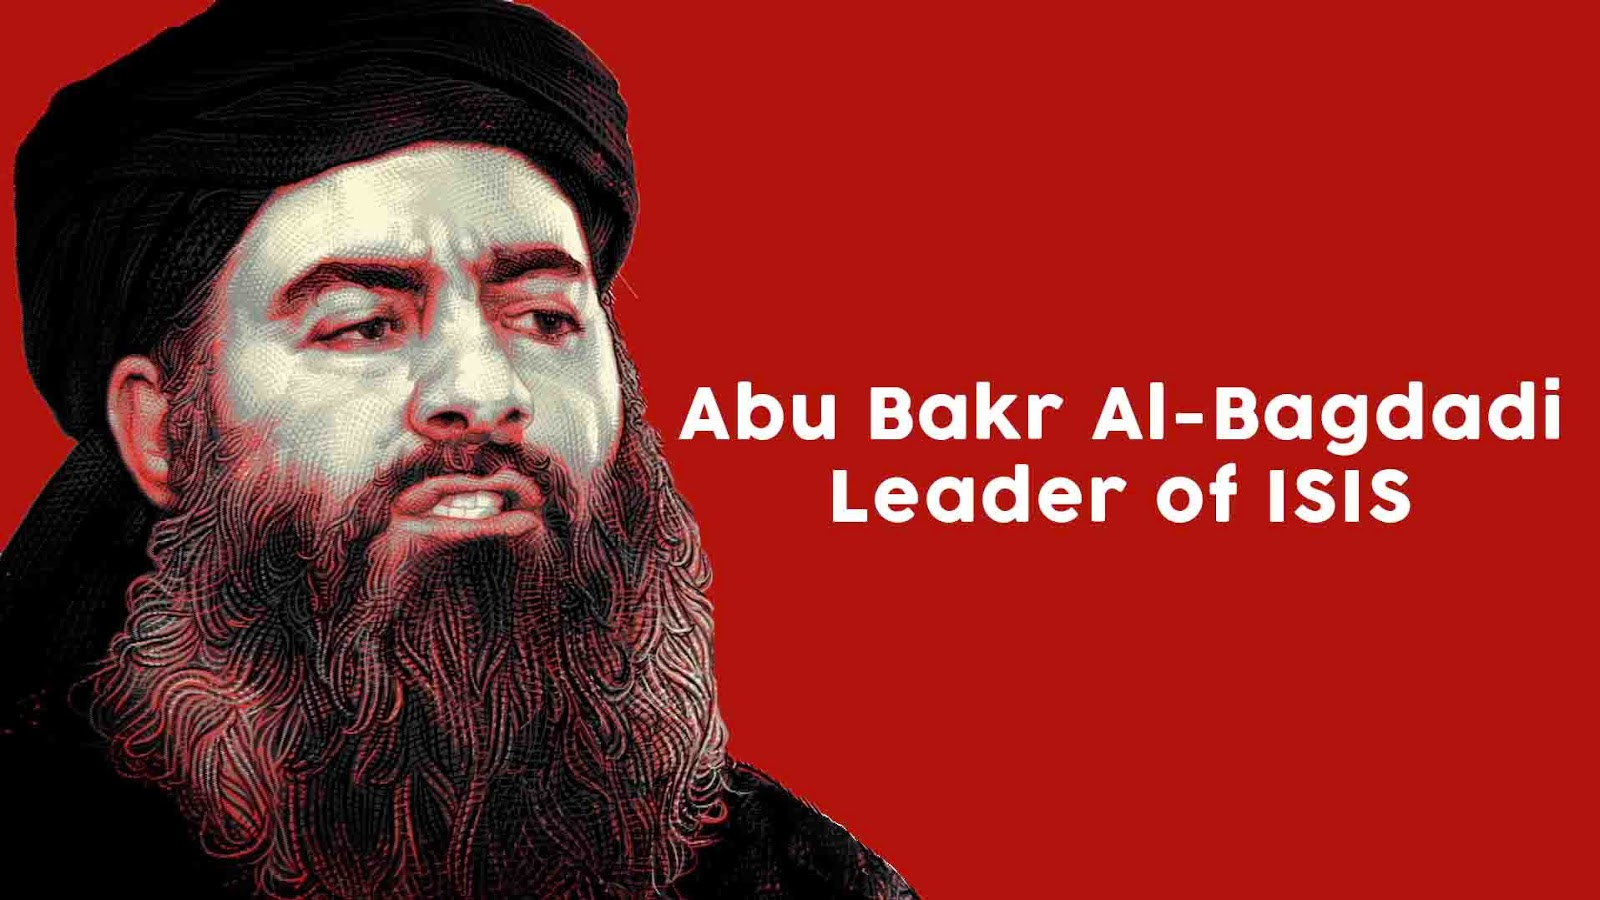 ISIS Leader, abu bakr al-baghdadi, terrorist audio speech, ISIS